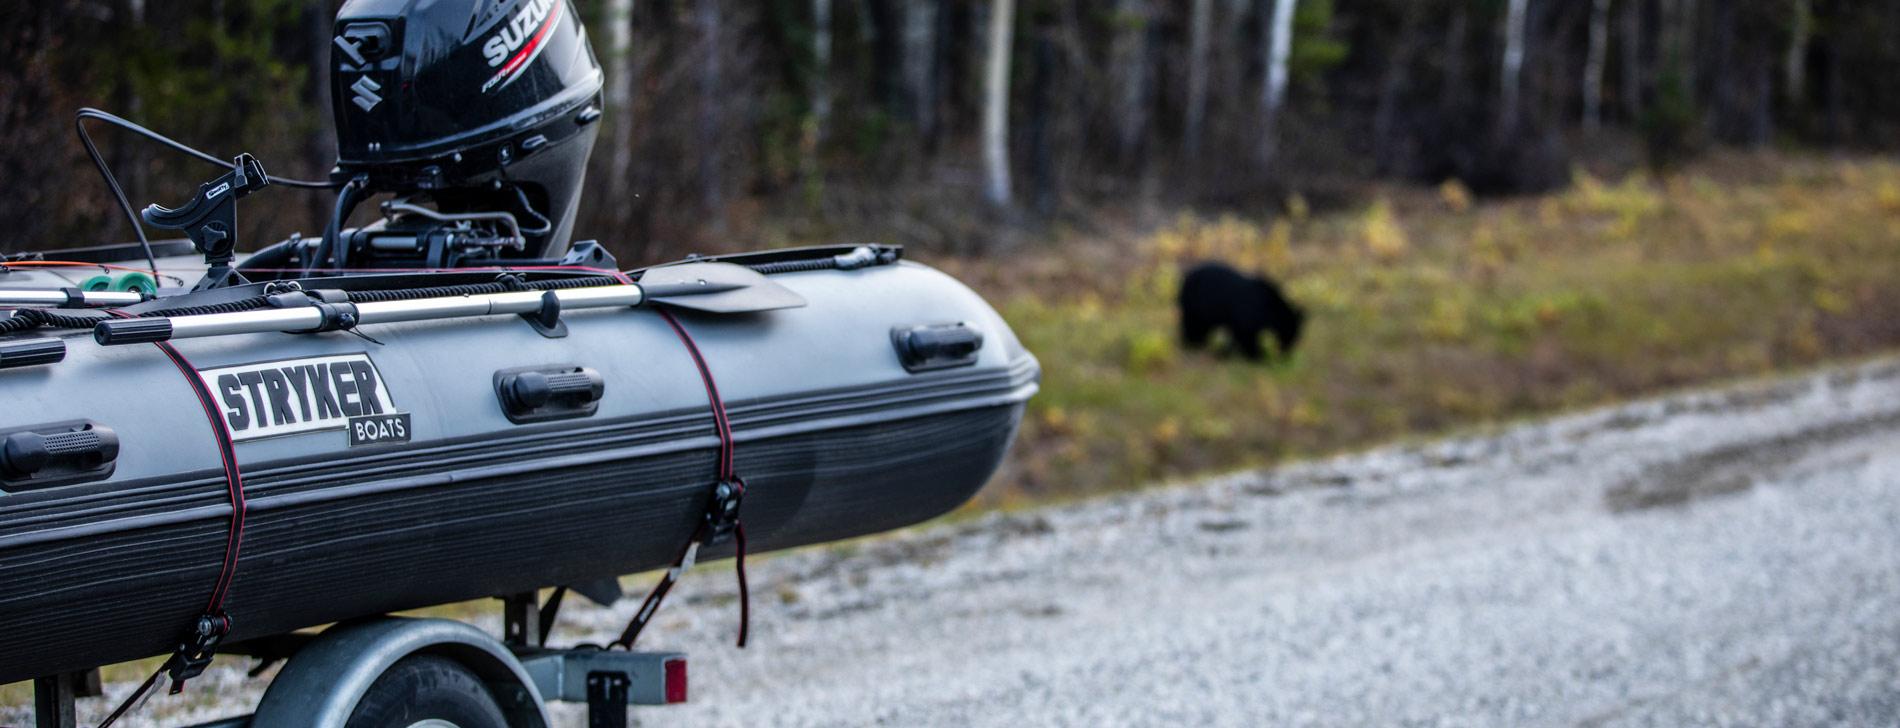 Stryker Inflatable Boats | Nanaimo